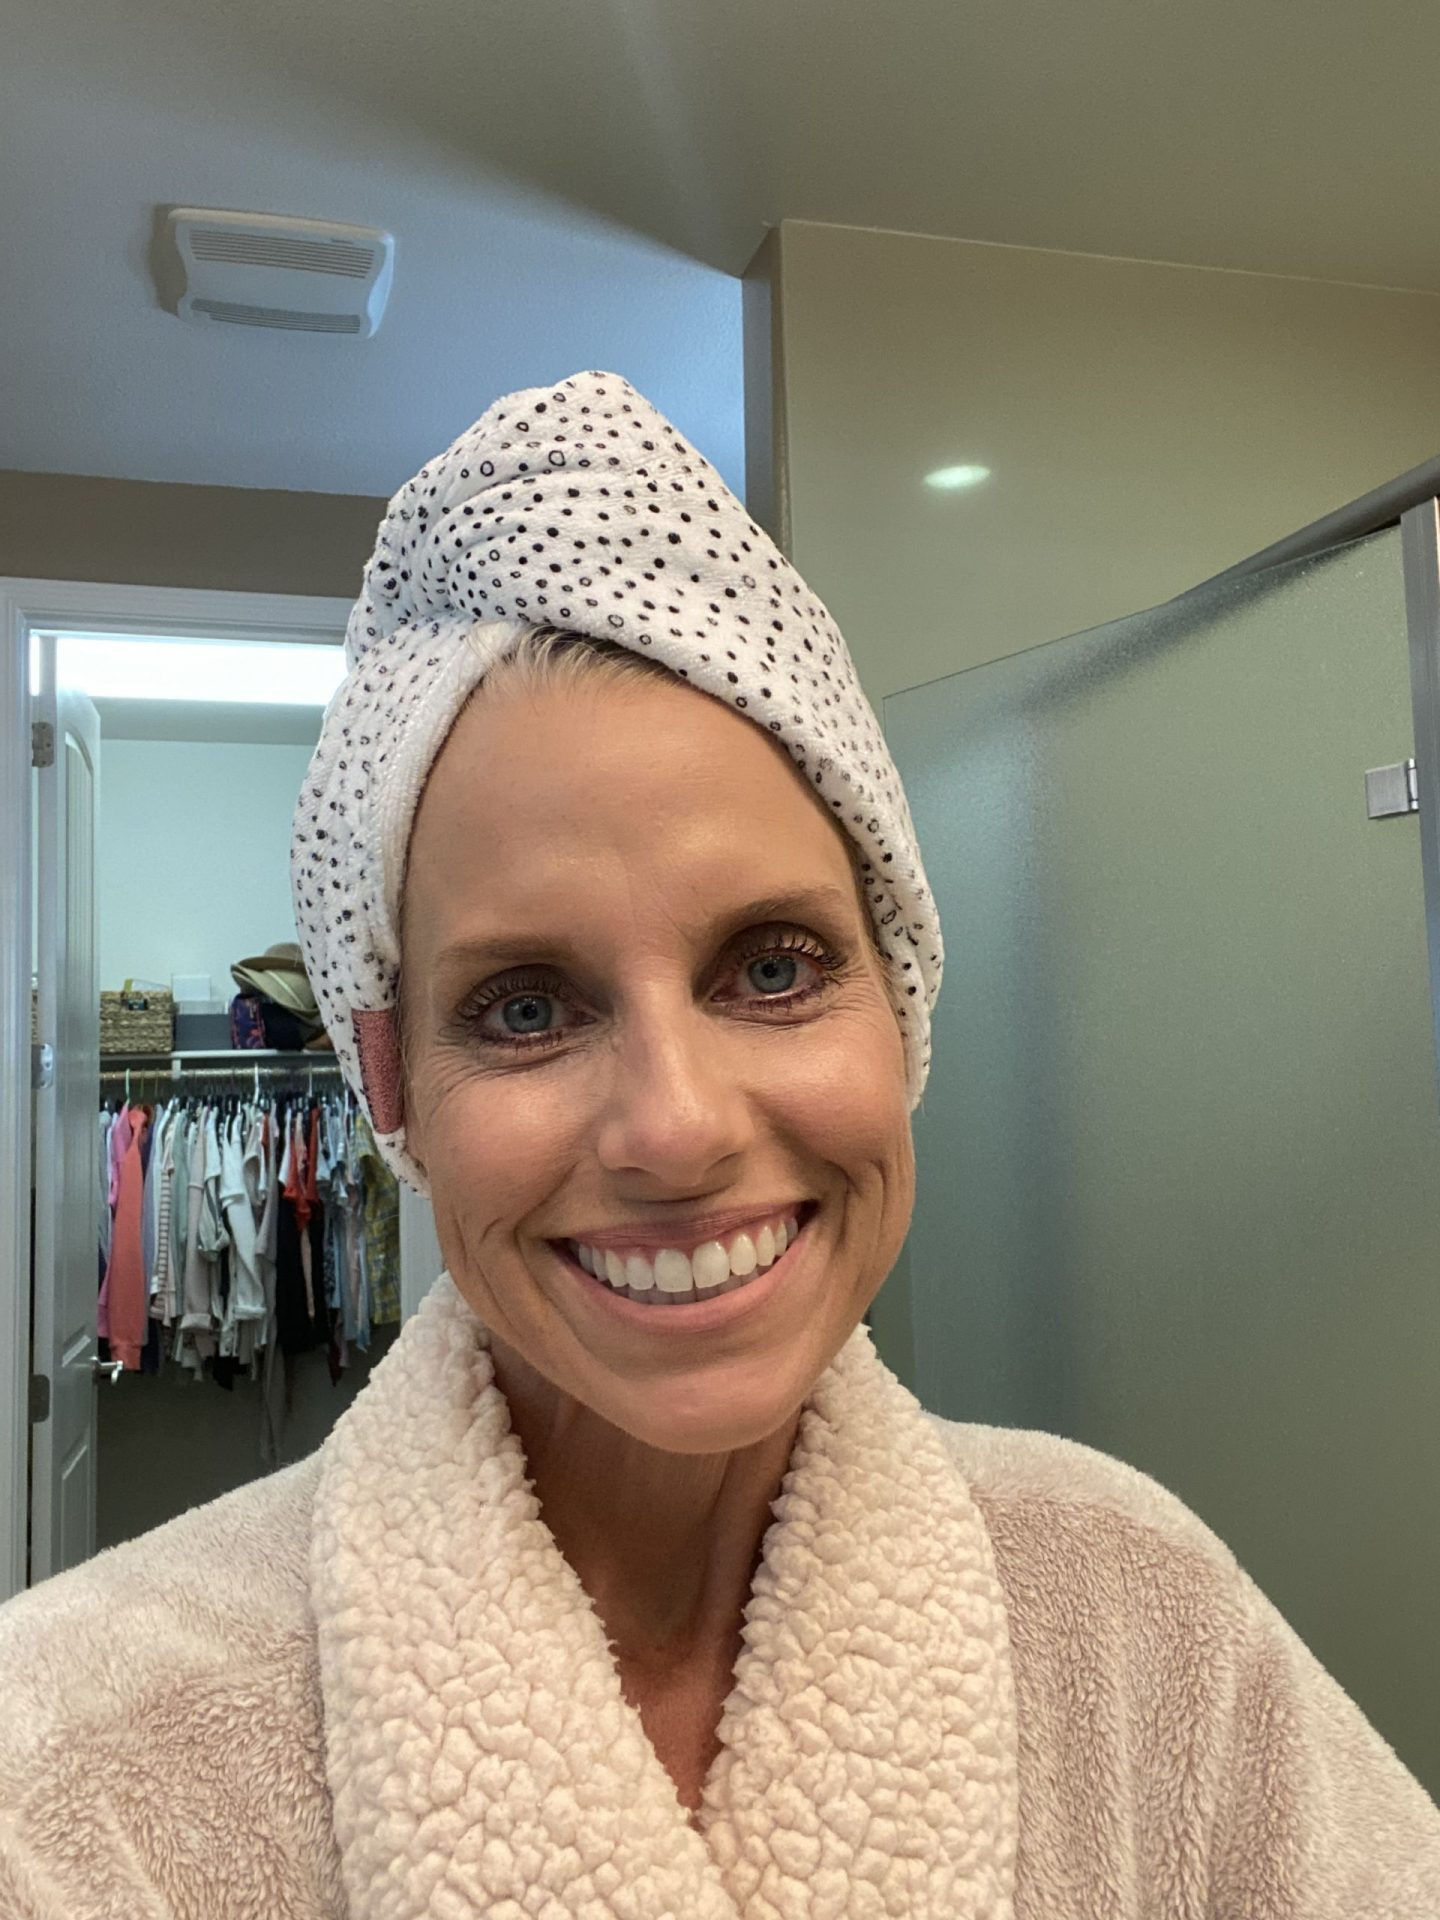 Kitsch Hair towel